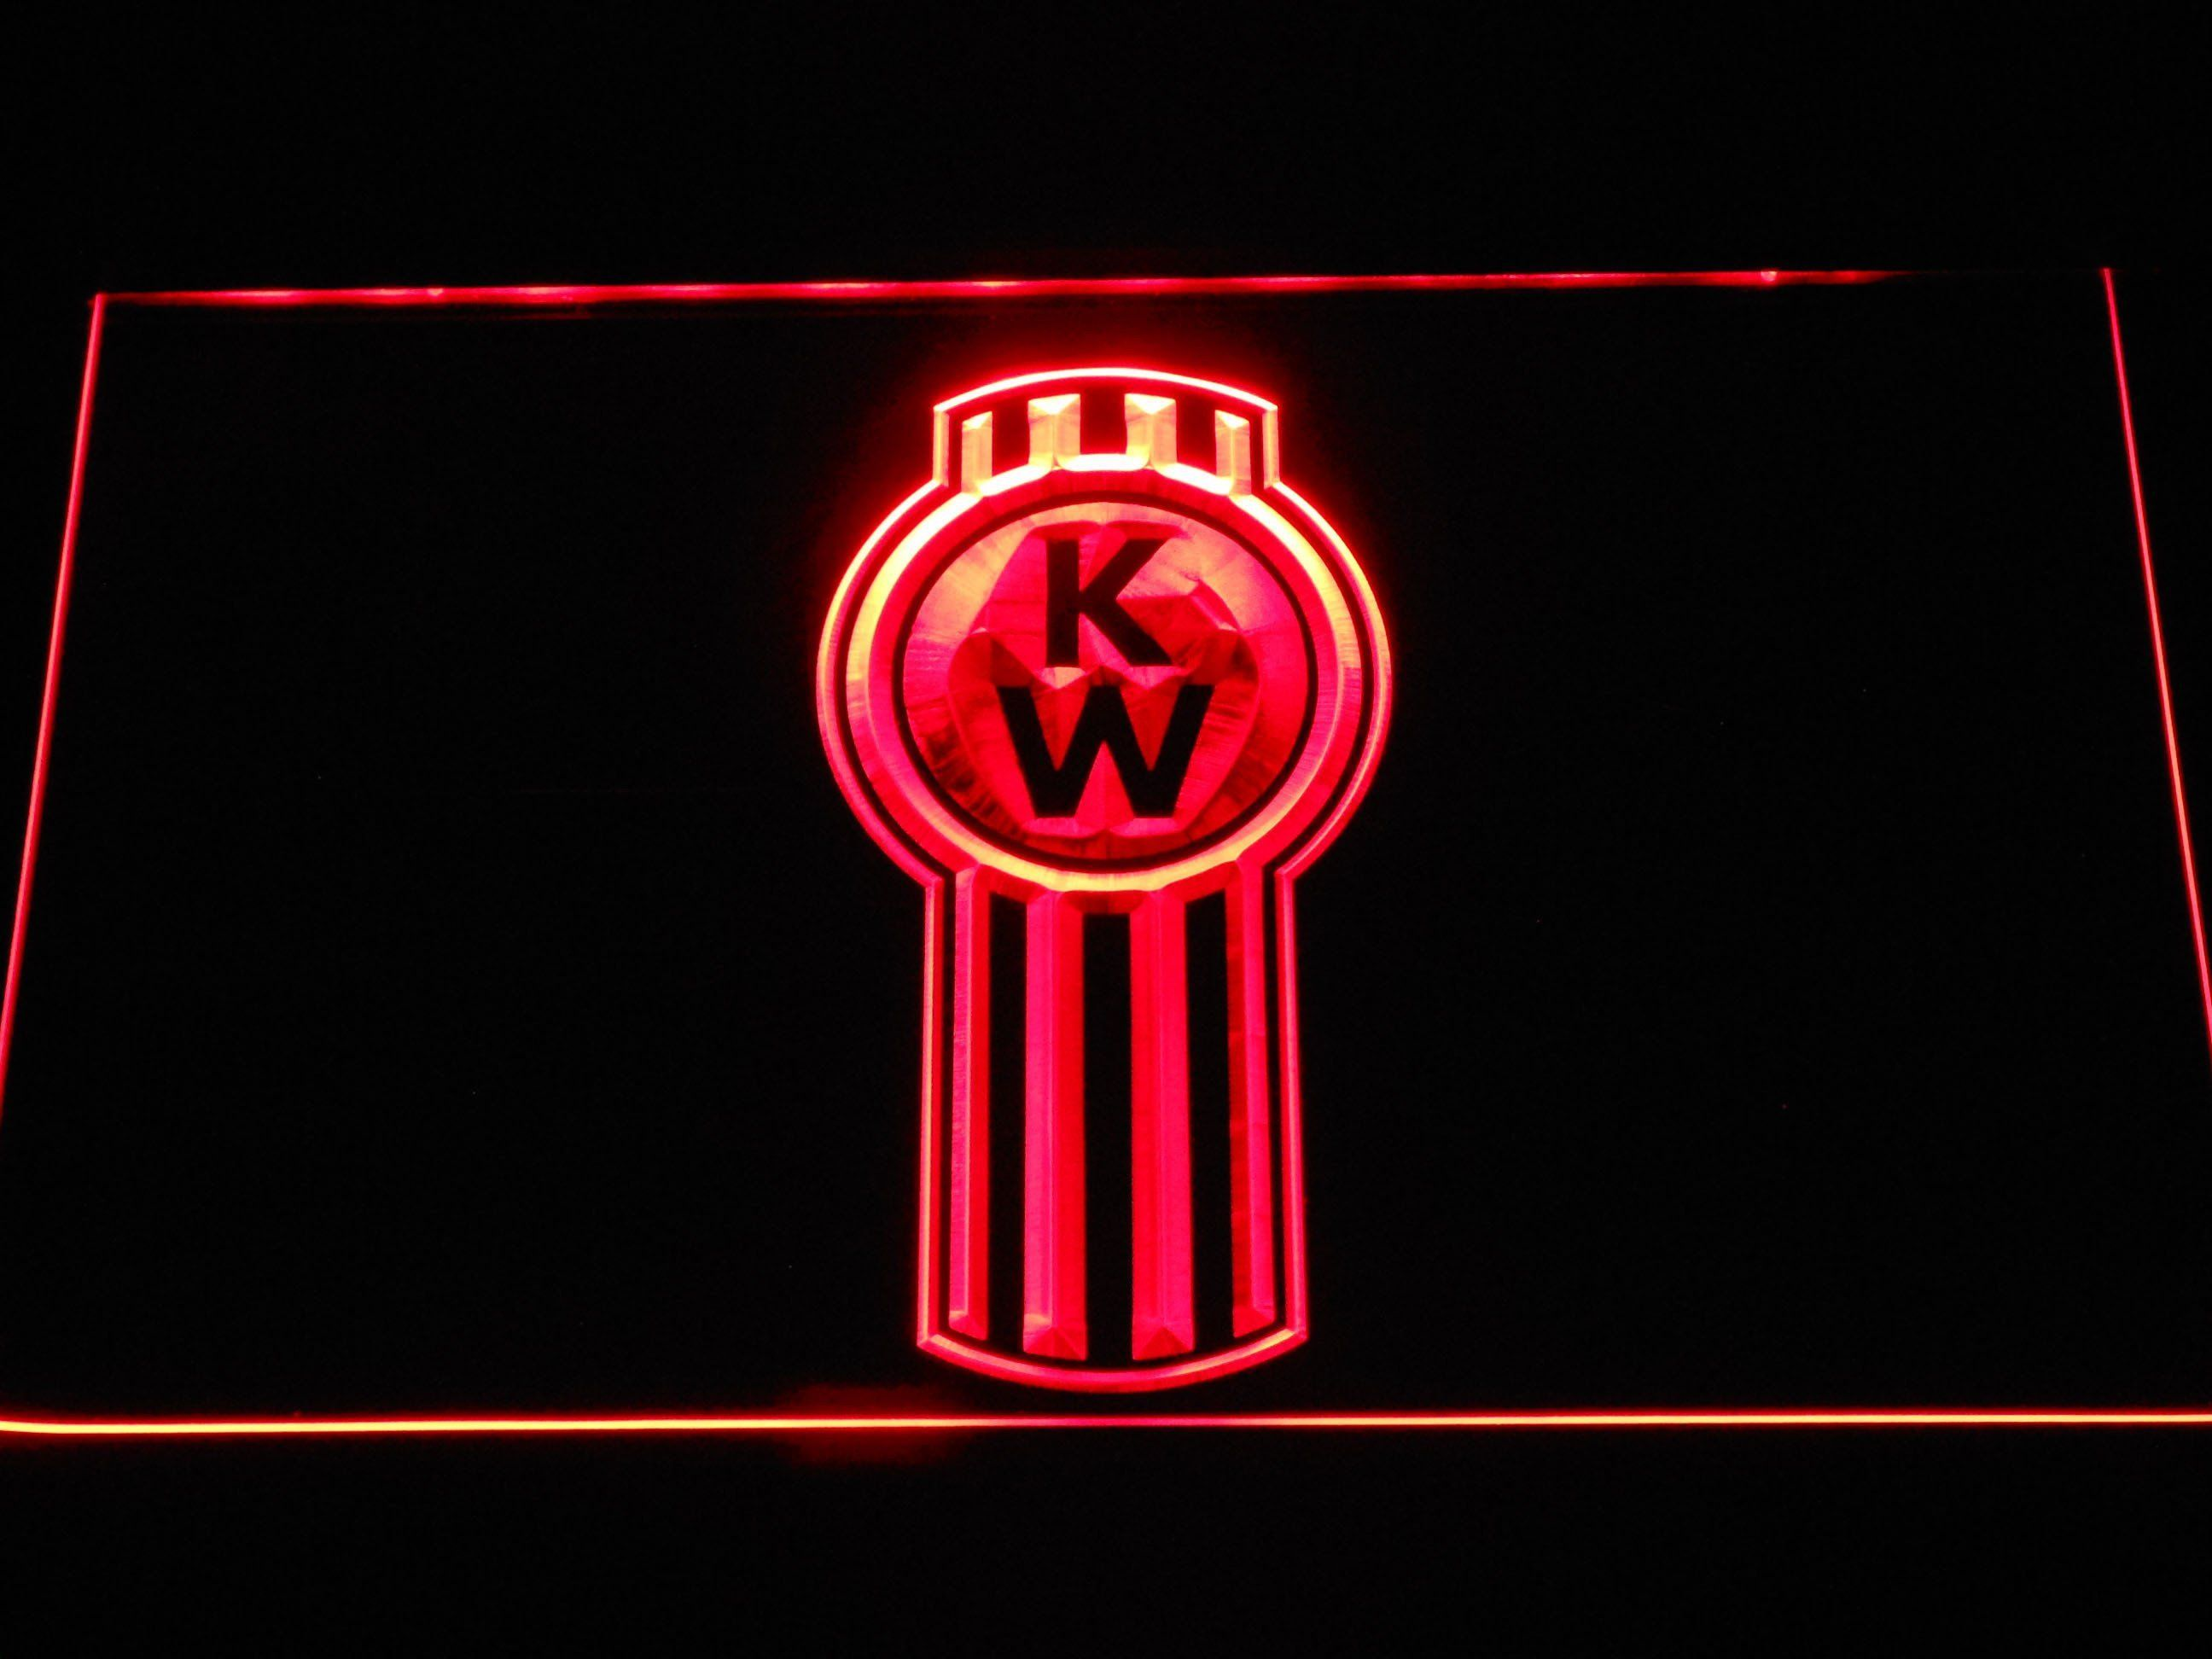 Kenworth Logo Kenworth Logos Kenworth Trucks